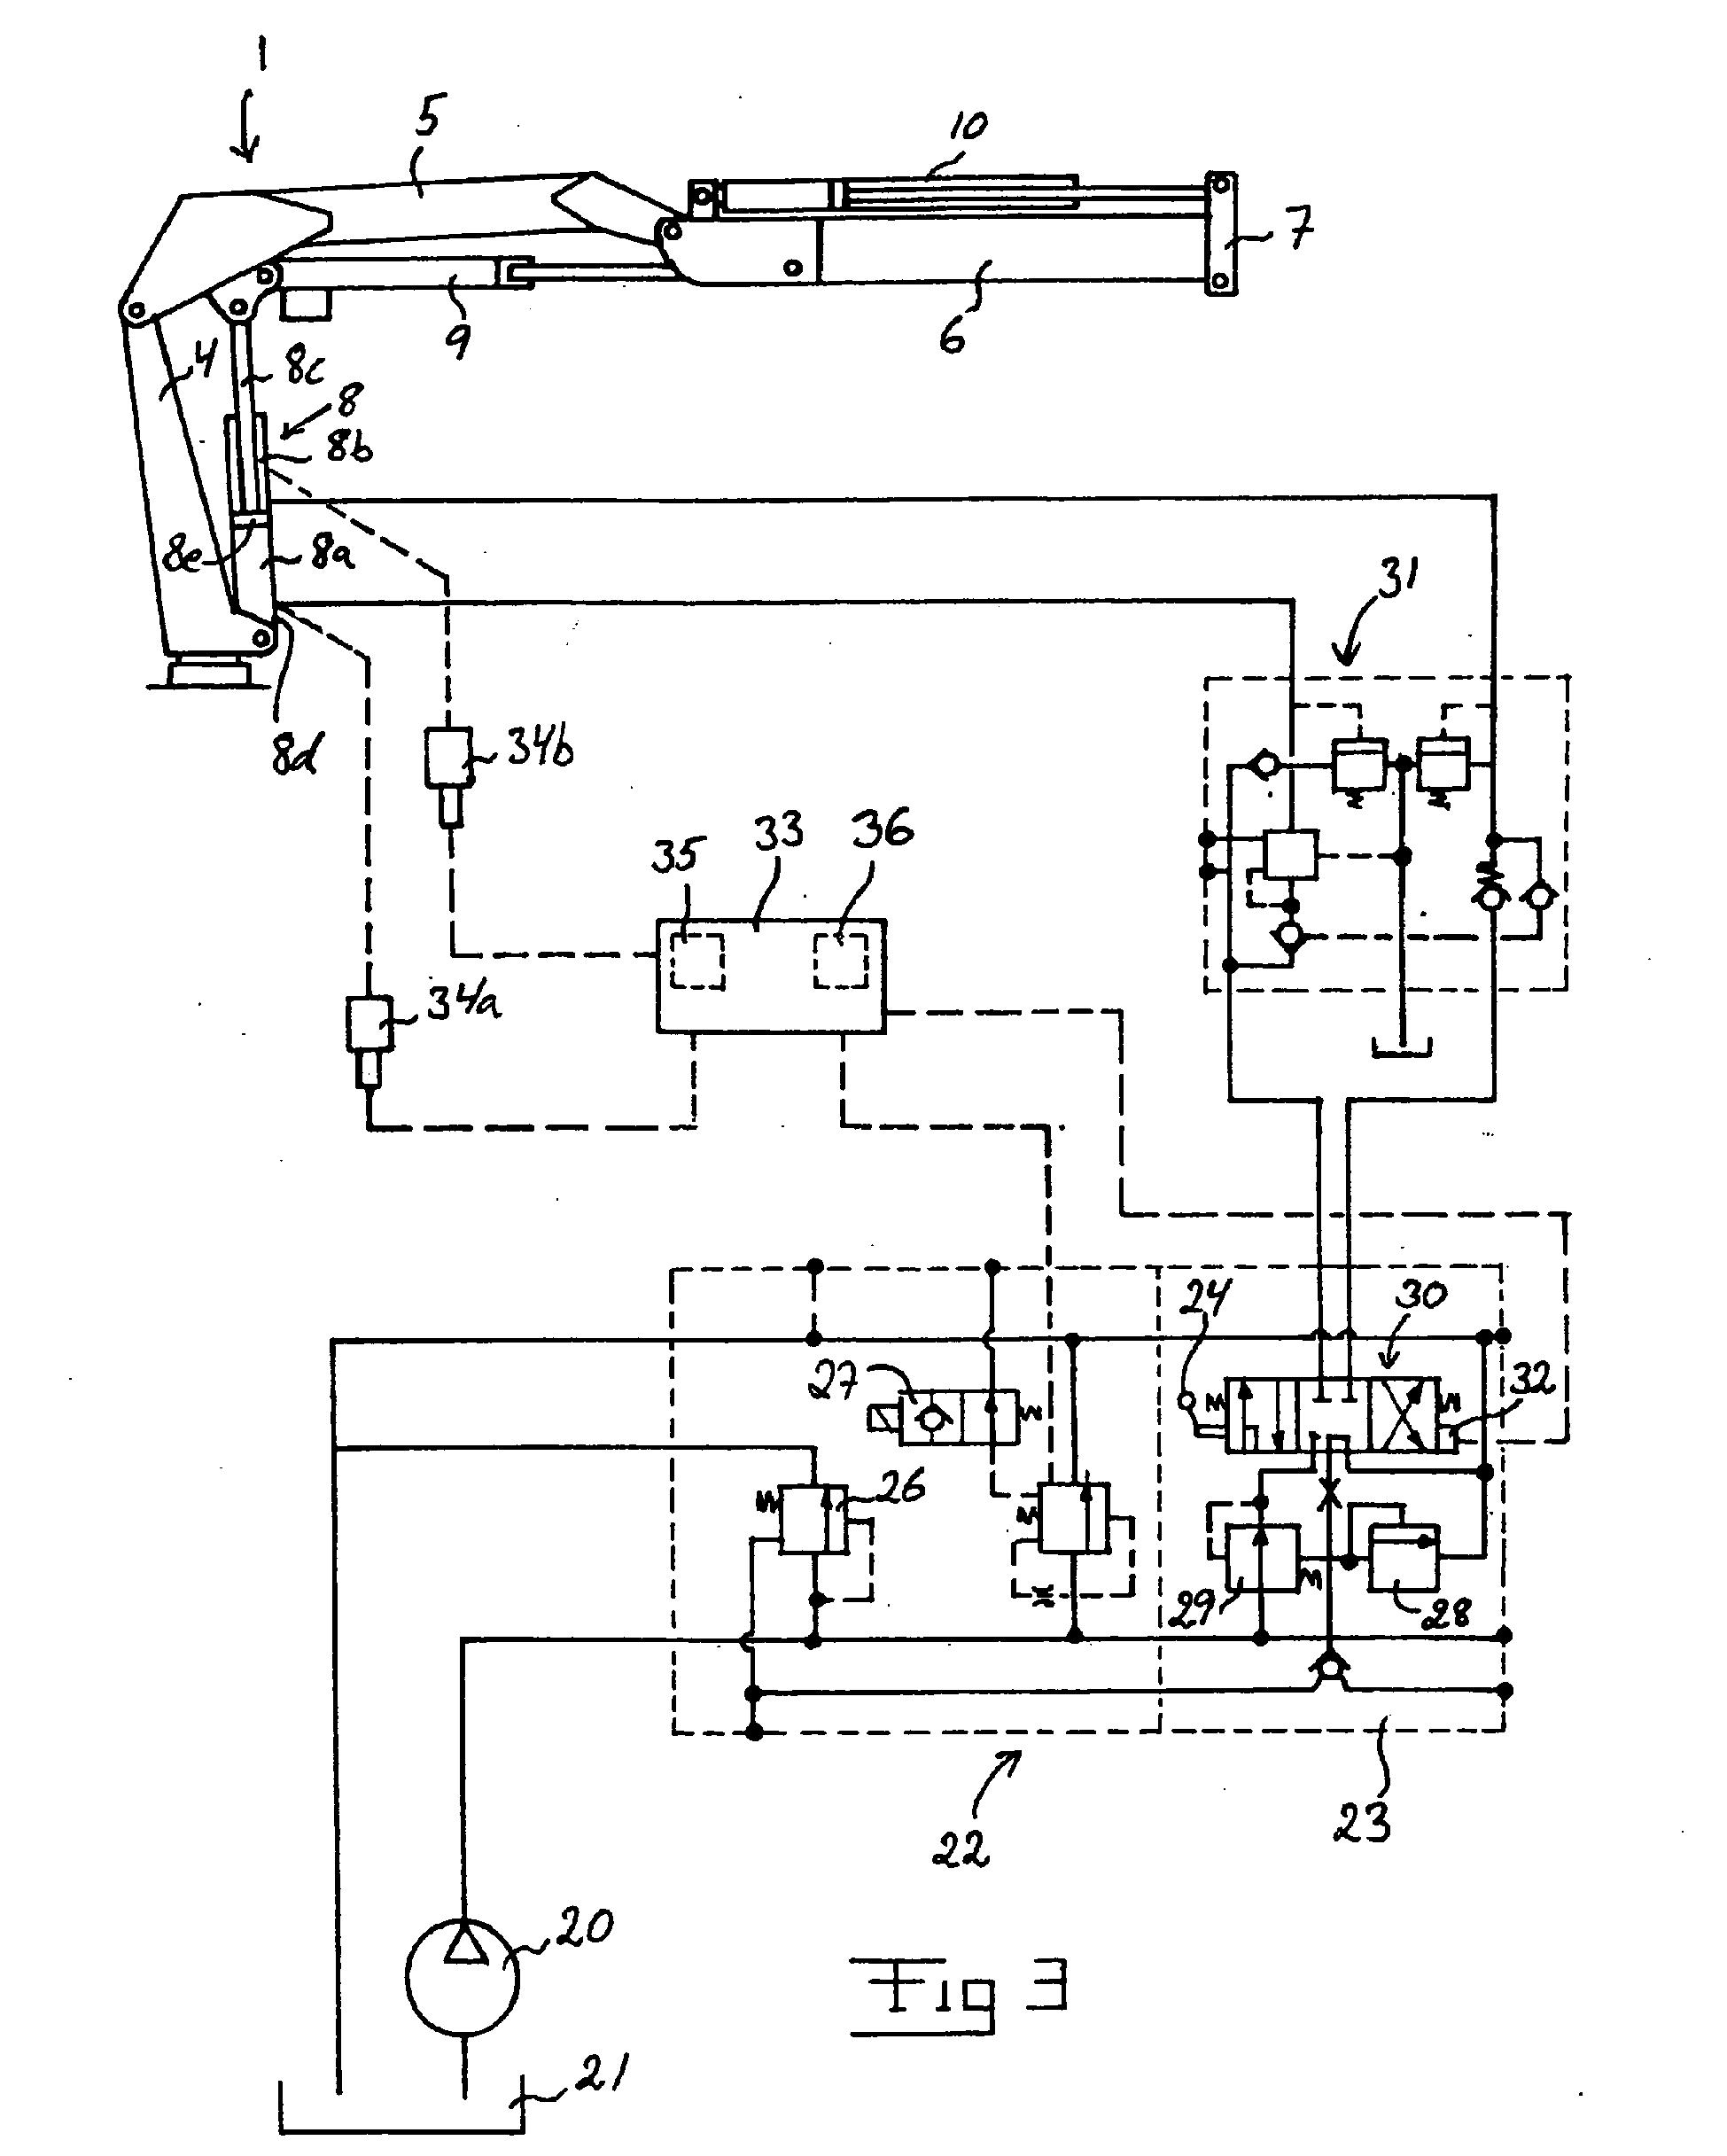 Diagrams Wiring Willys Pickup Wiring Diagram